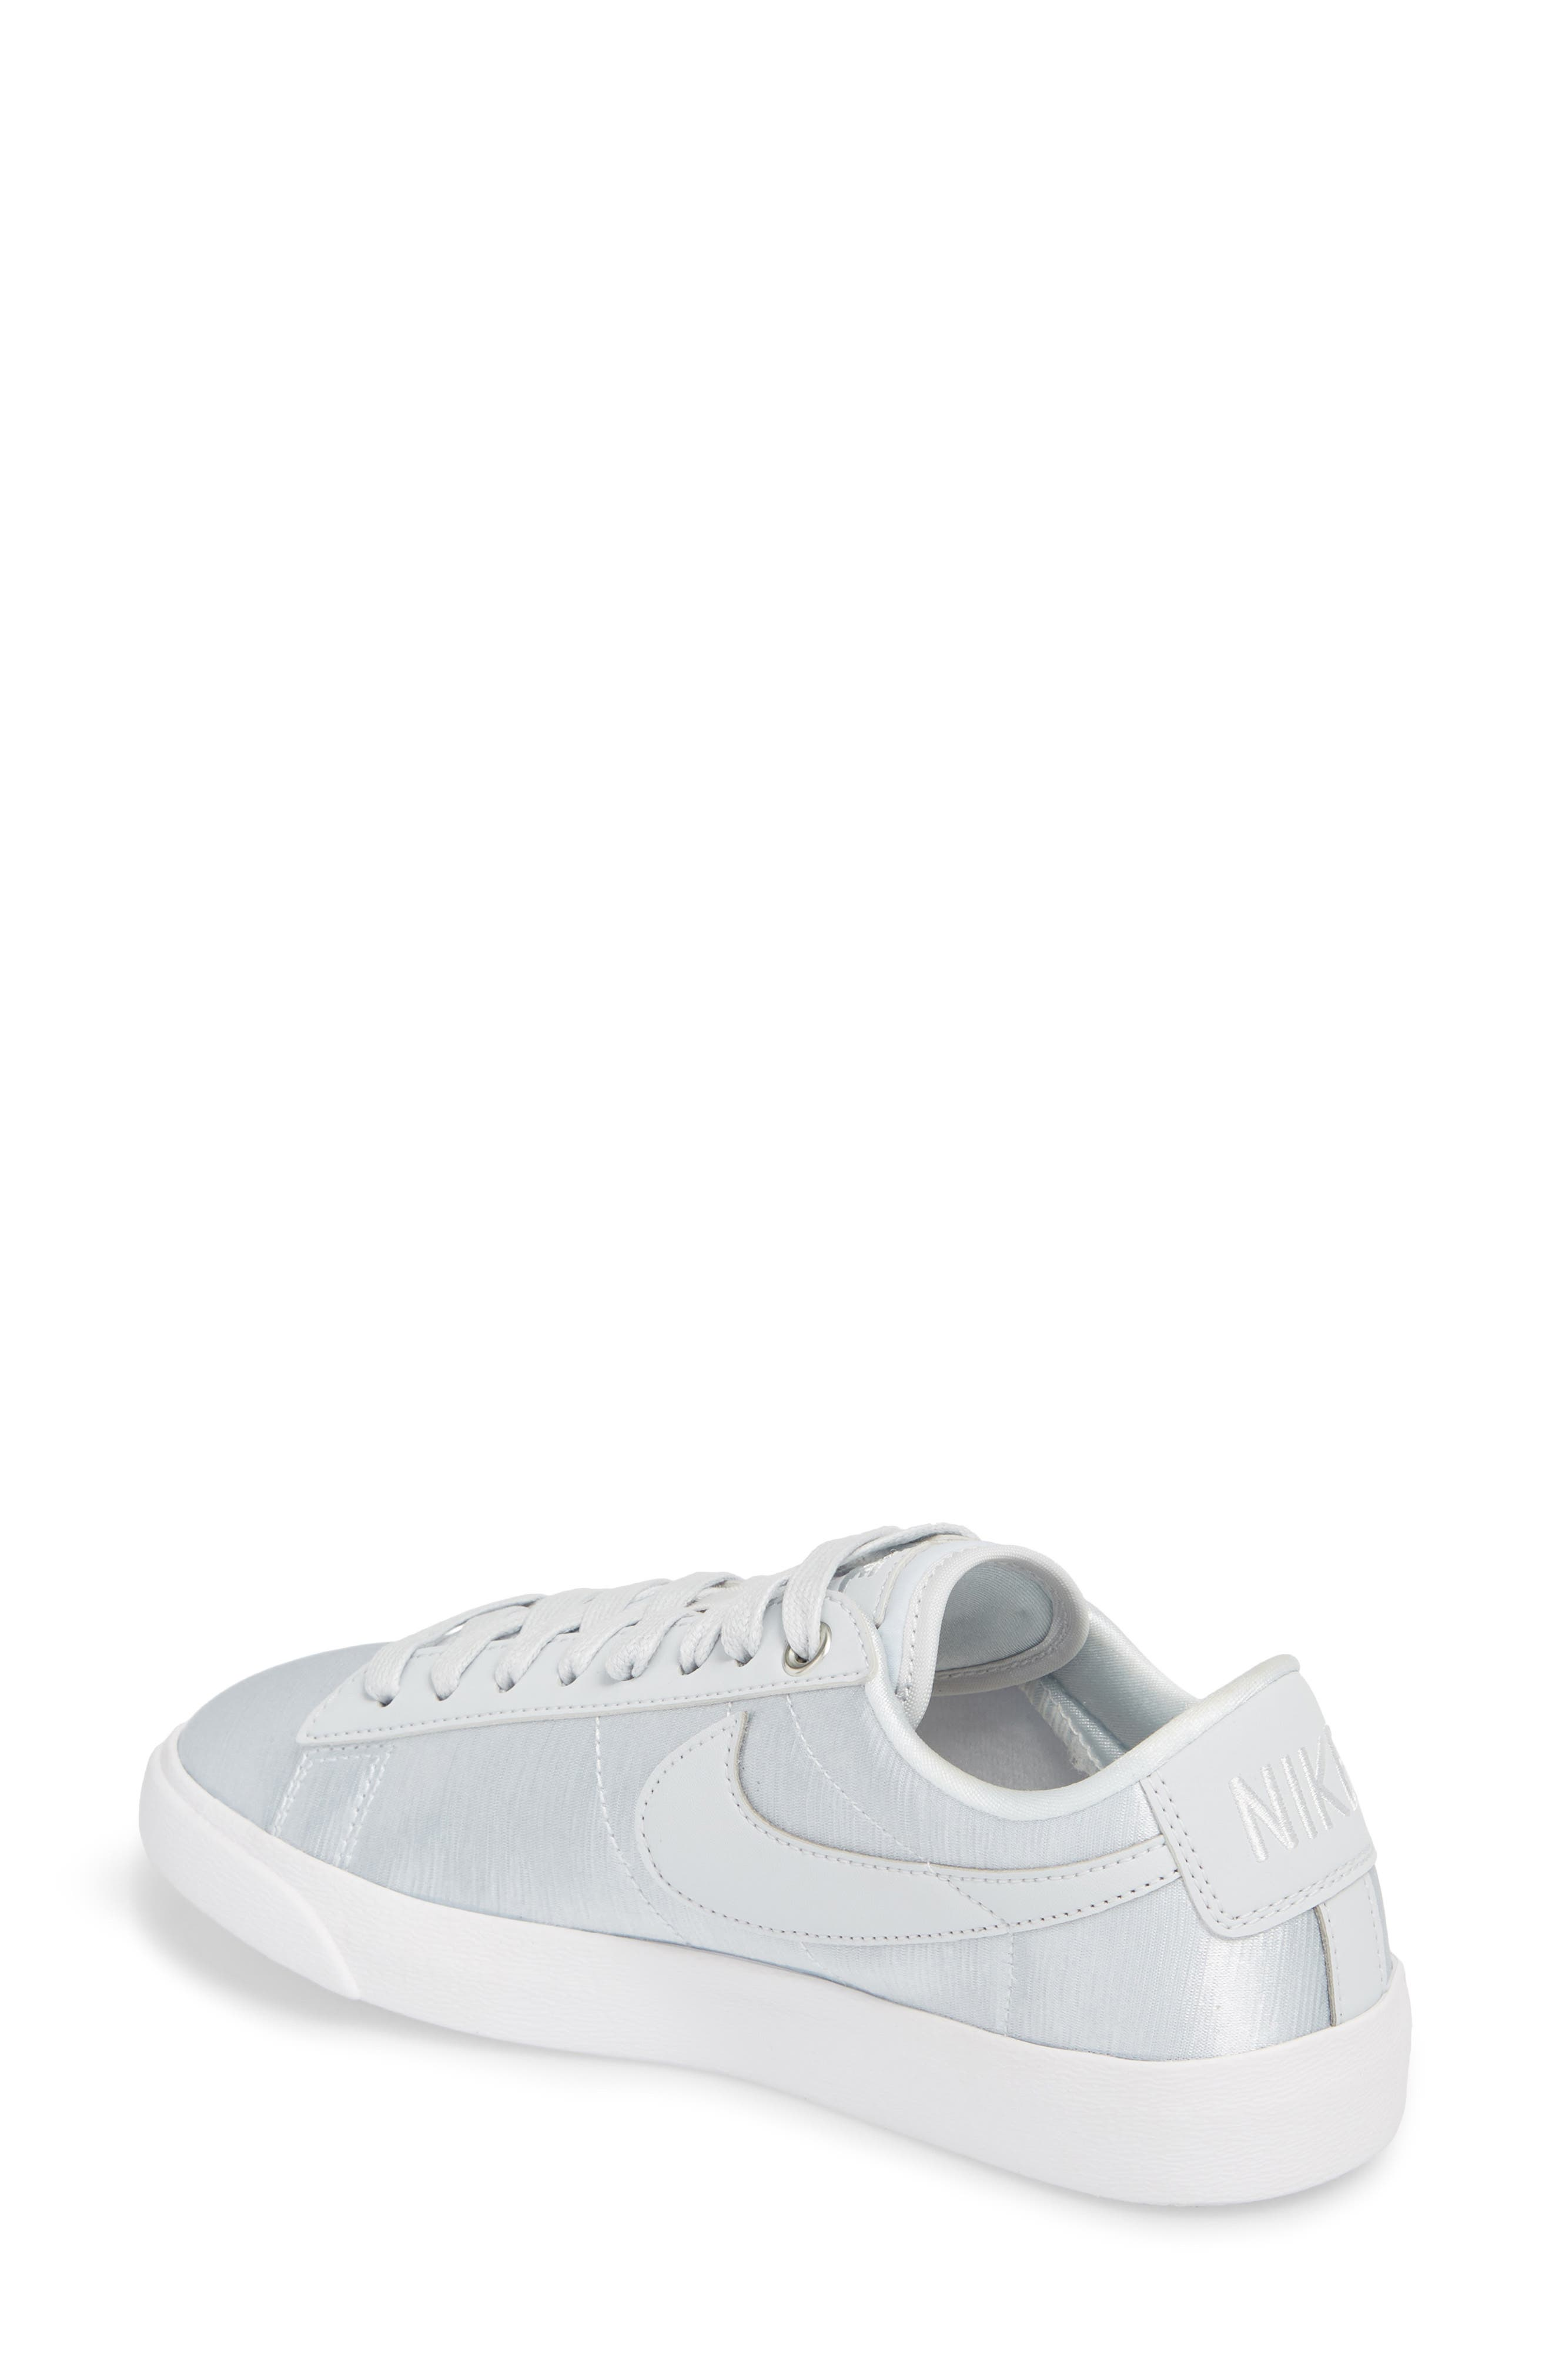 Blazer Low Top Sneaker SE,                             Alternate thumbnail 2, color,                             040